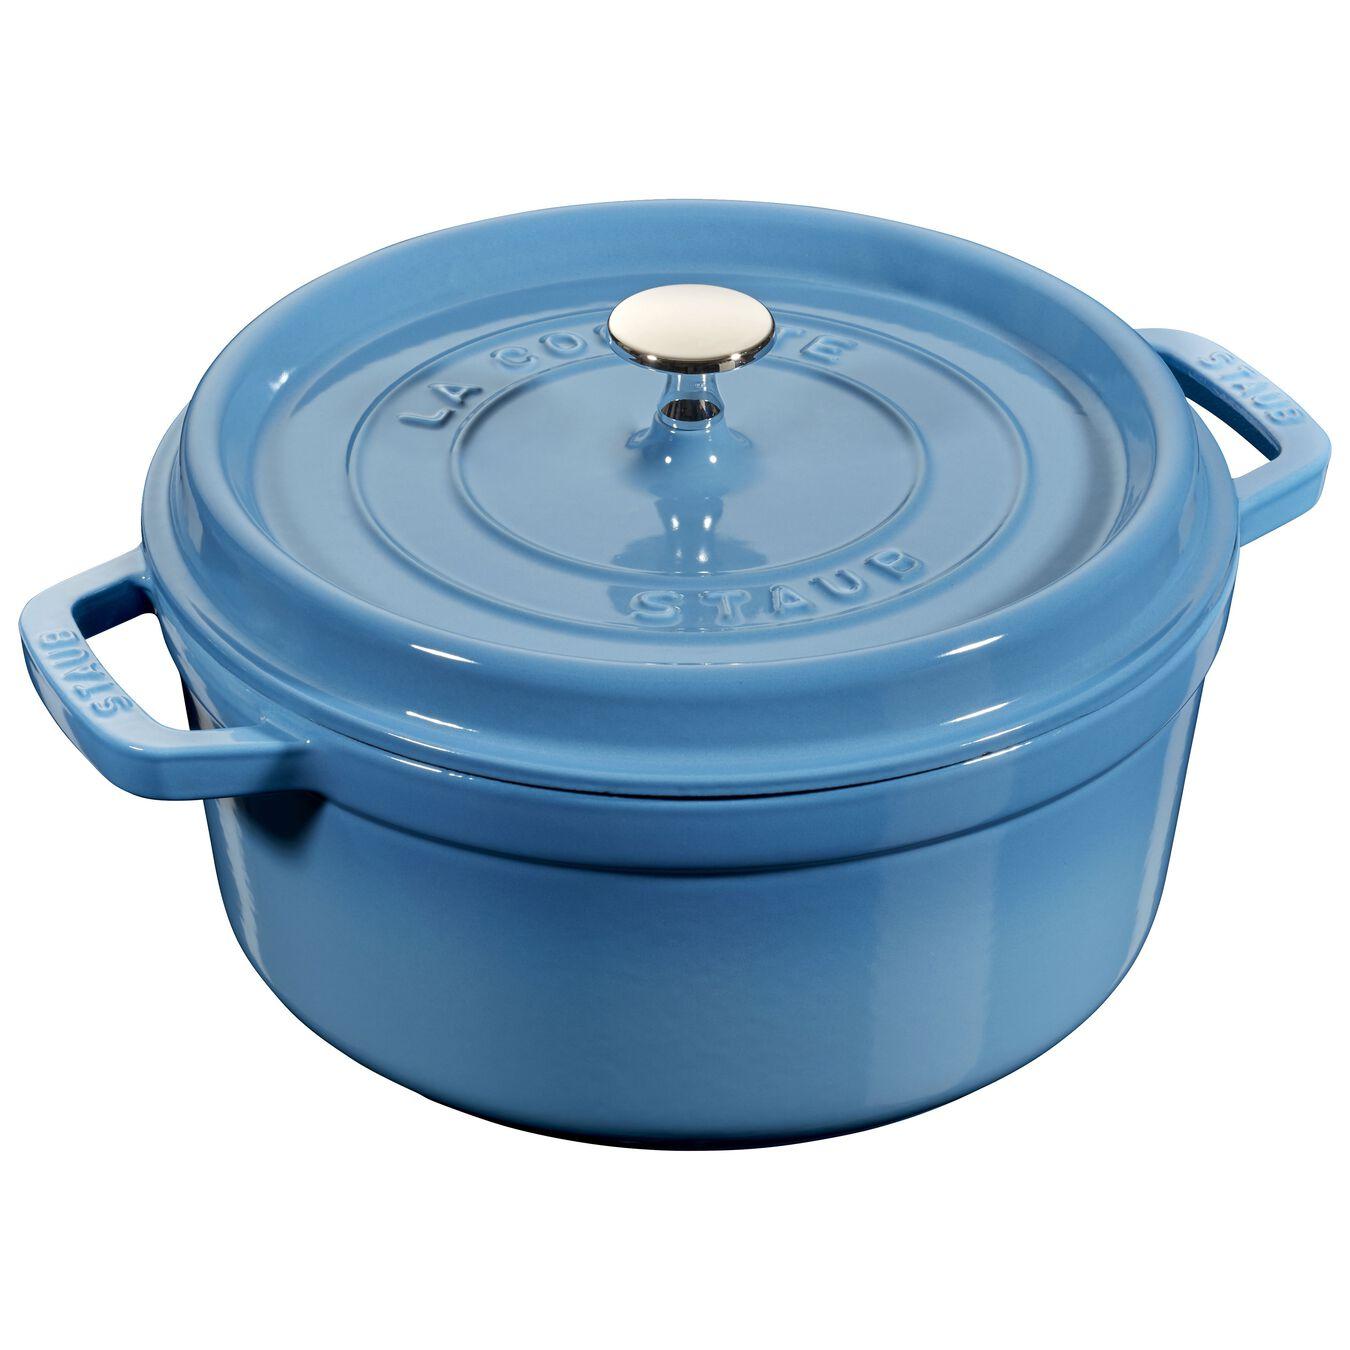 7-qt, round, Cocotte, Ice-Blue,,large 1